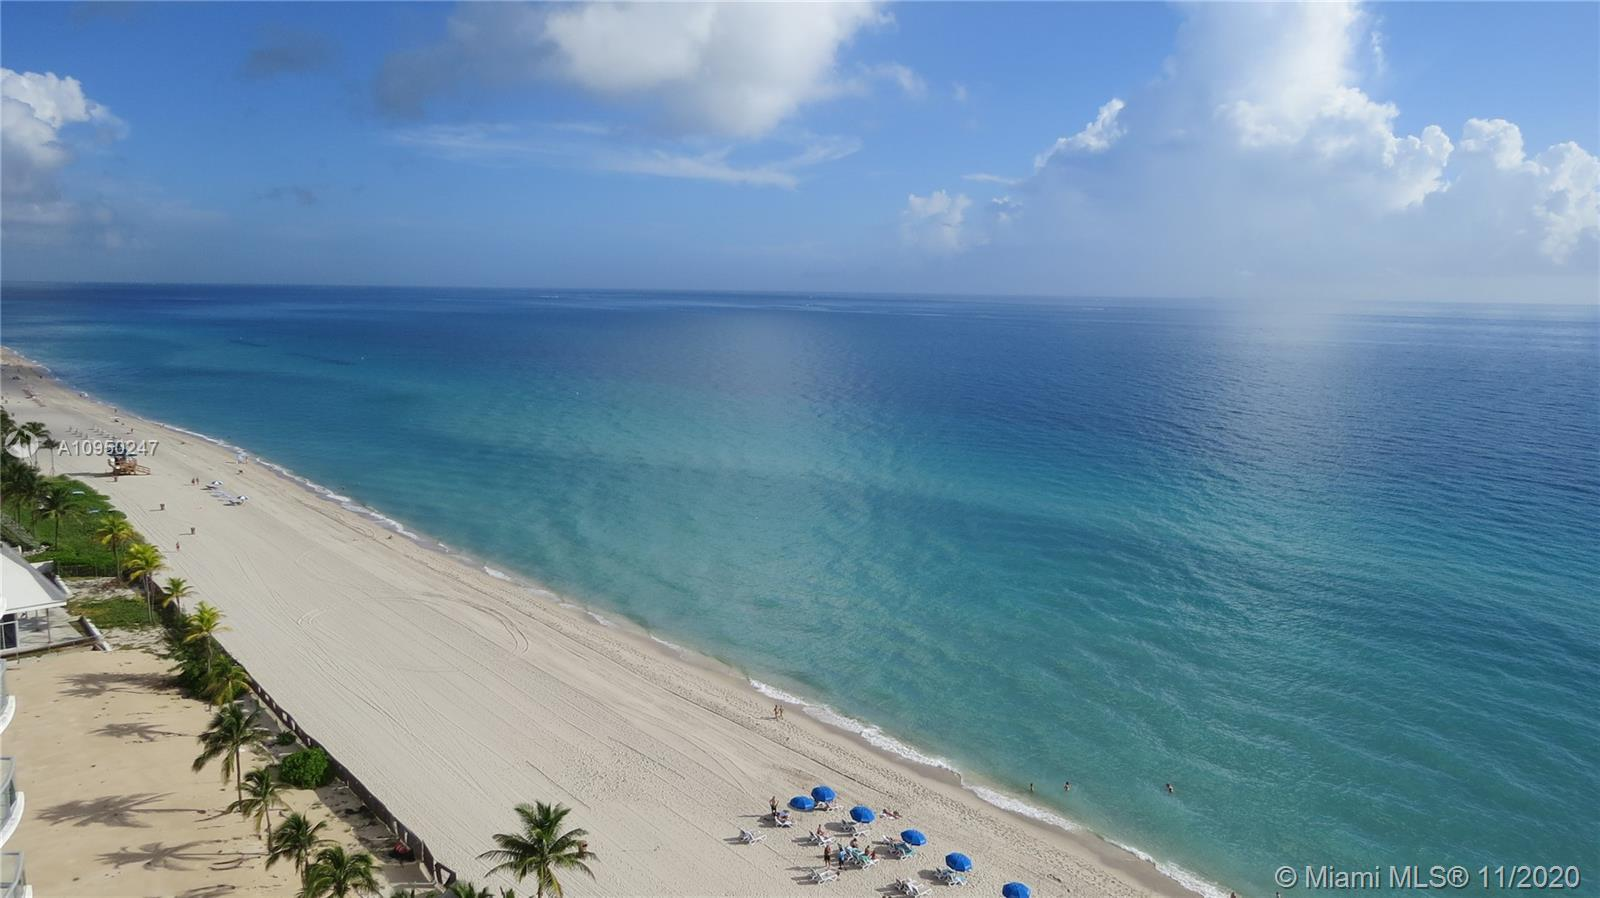 Millennium Condo / Sunny Isles Beach / 3 Beds + Den / 3.5 Baths / 2,210 sq. ft. of living area / lar